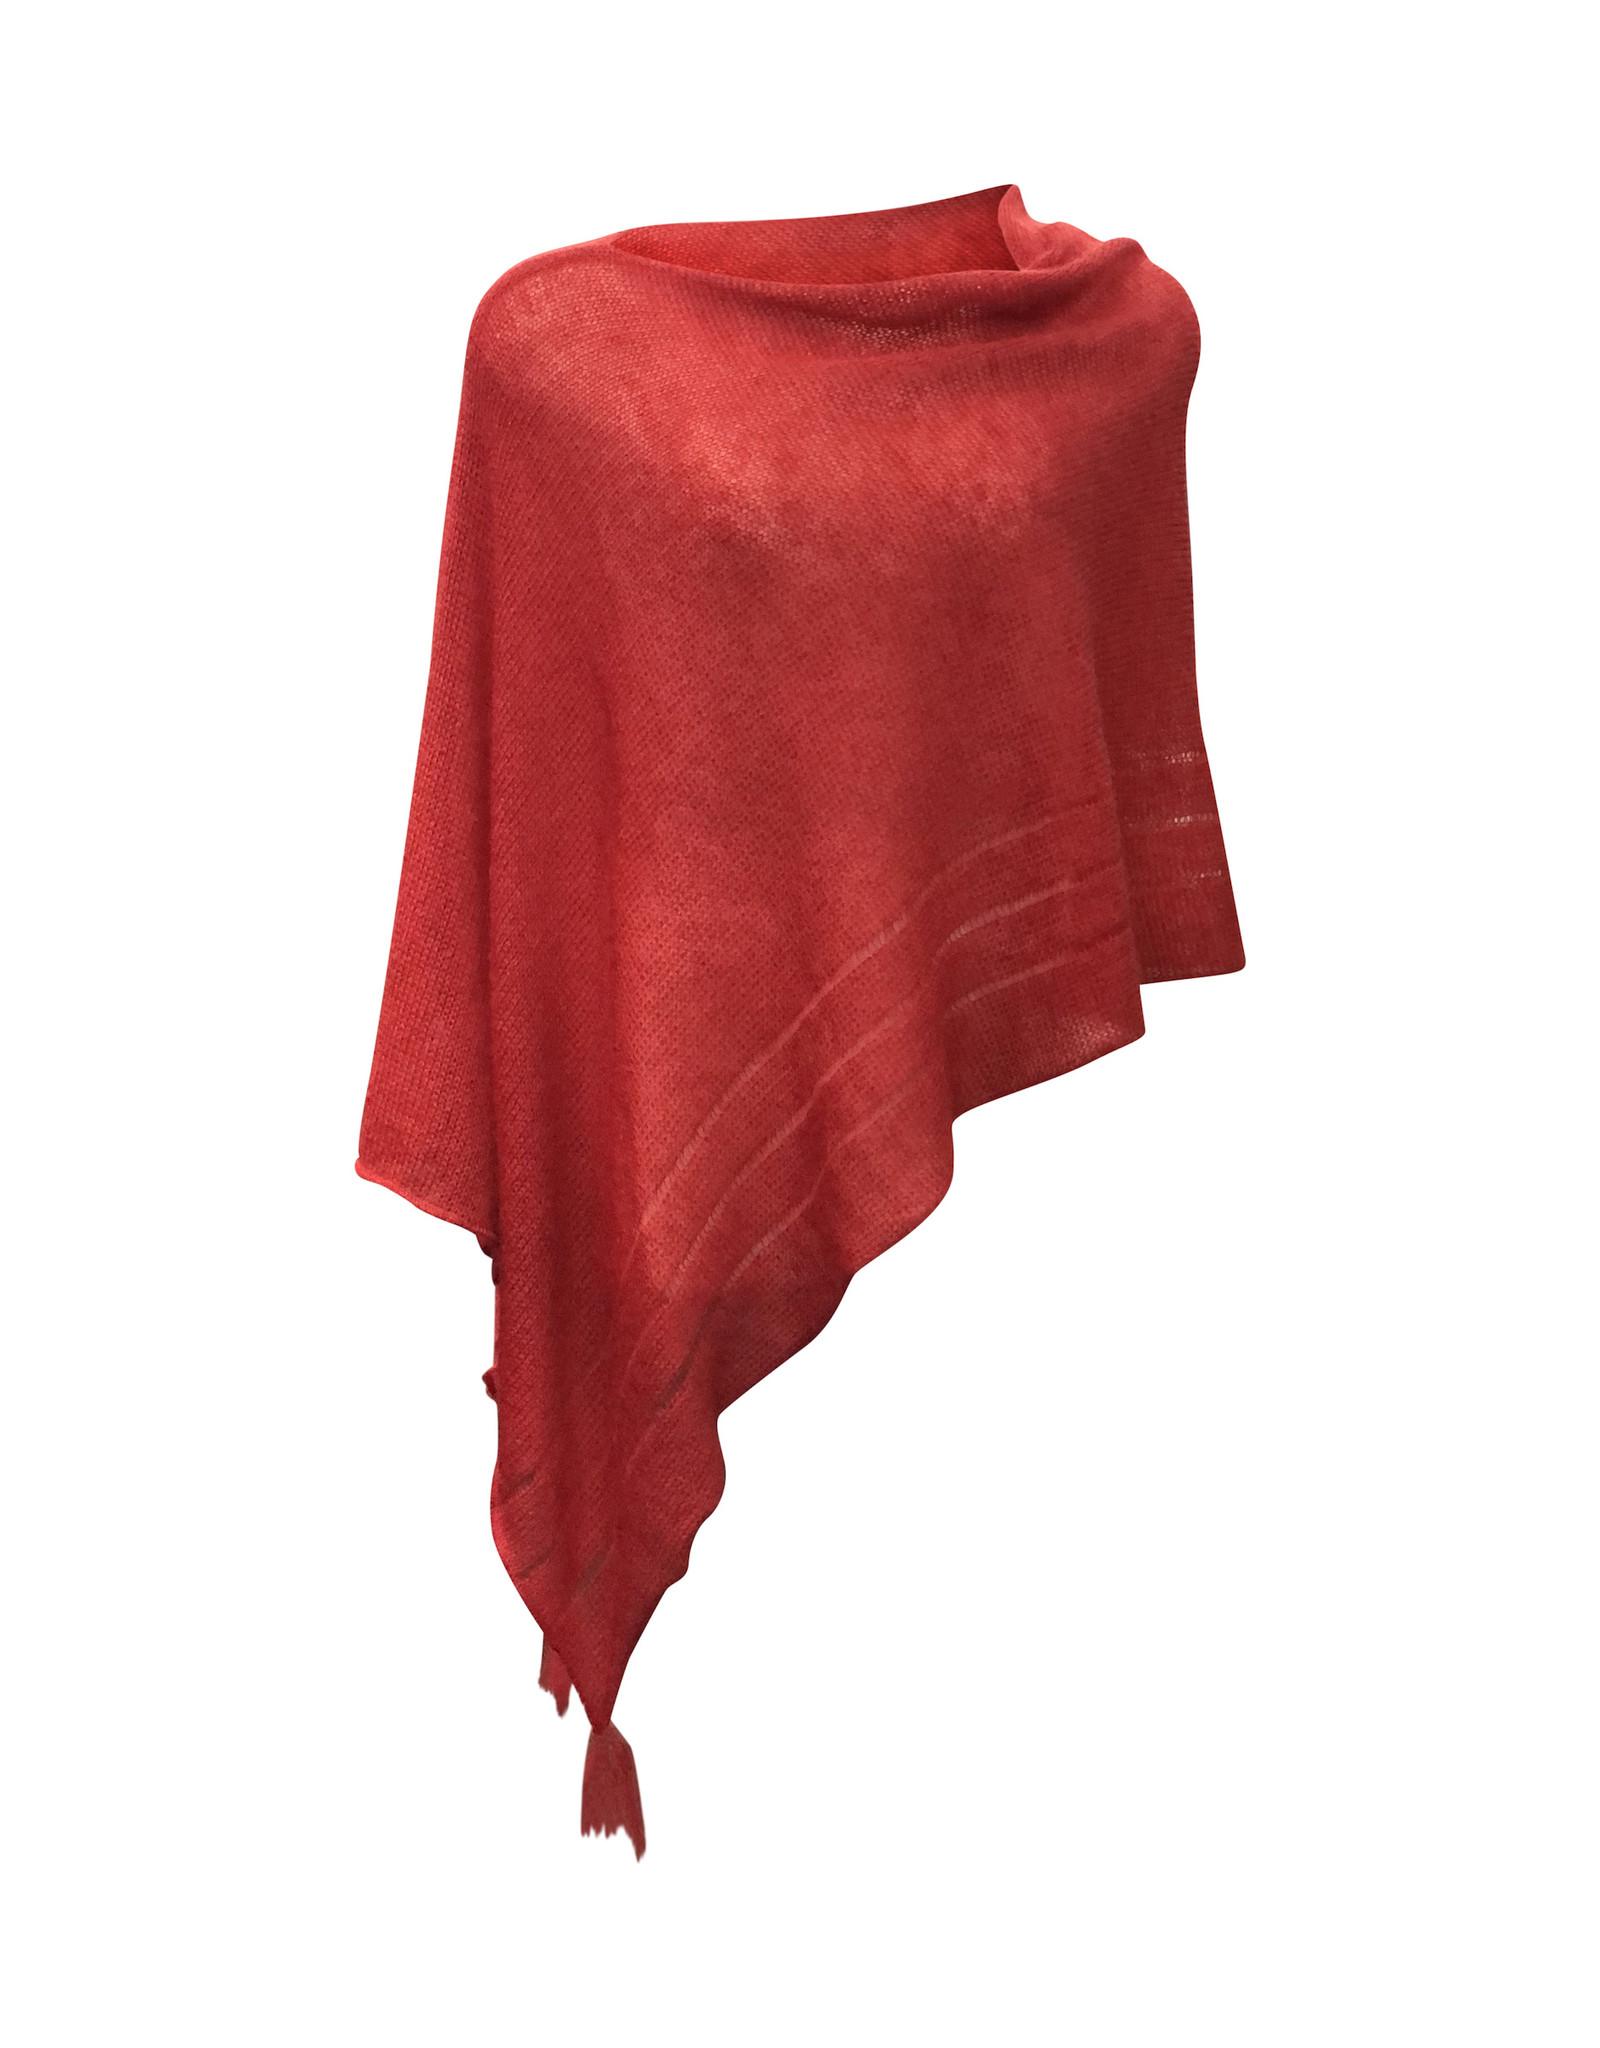 Ireland-Merino Wool Poncho in Red